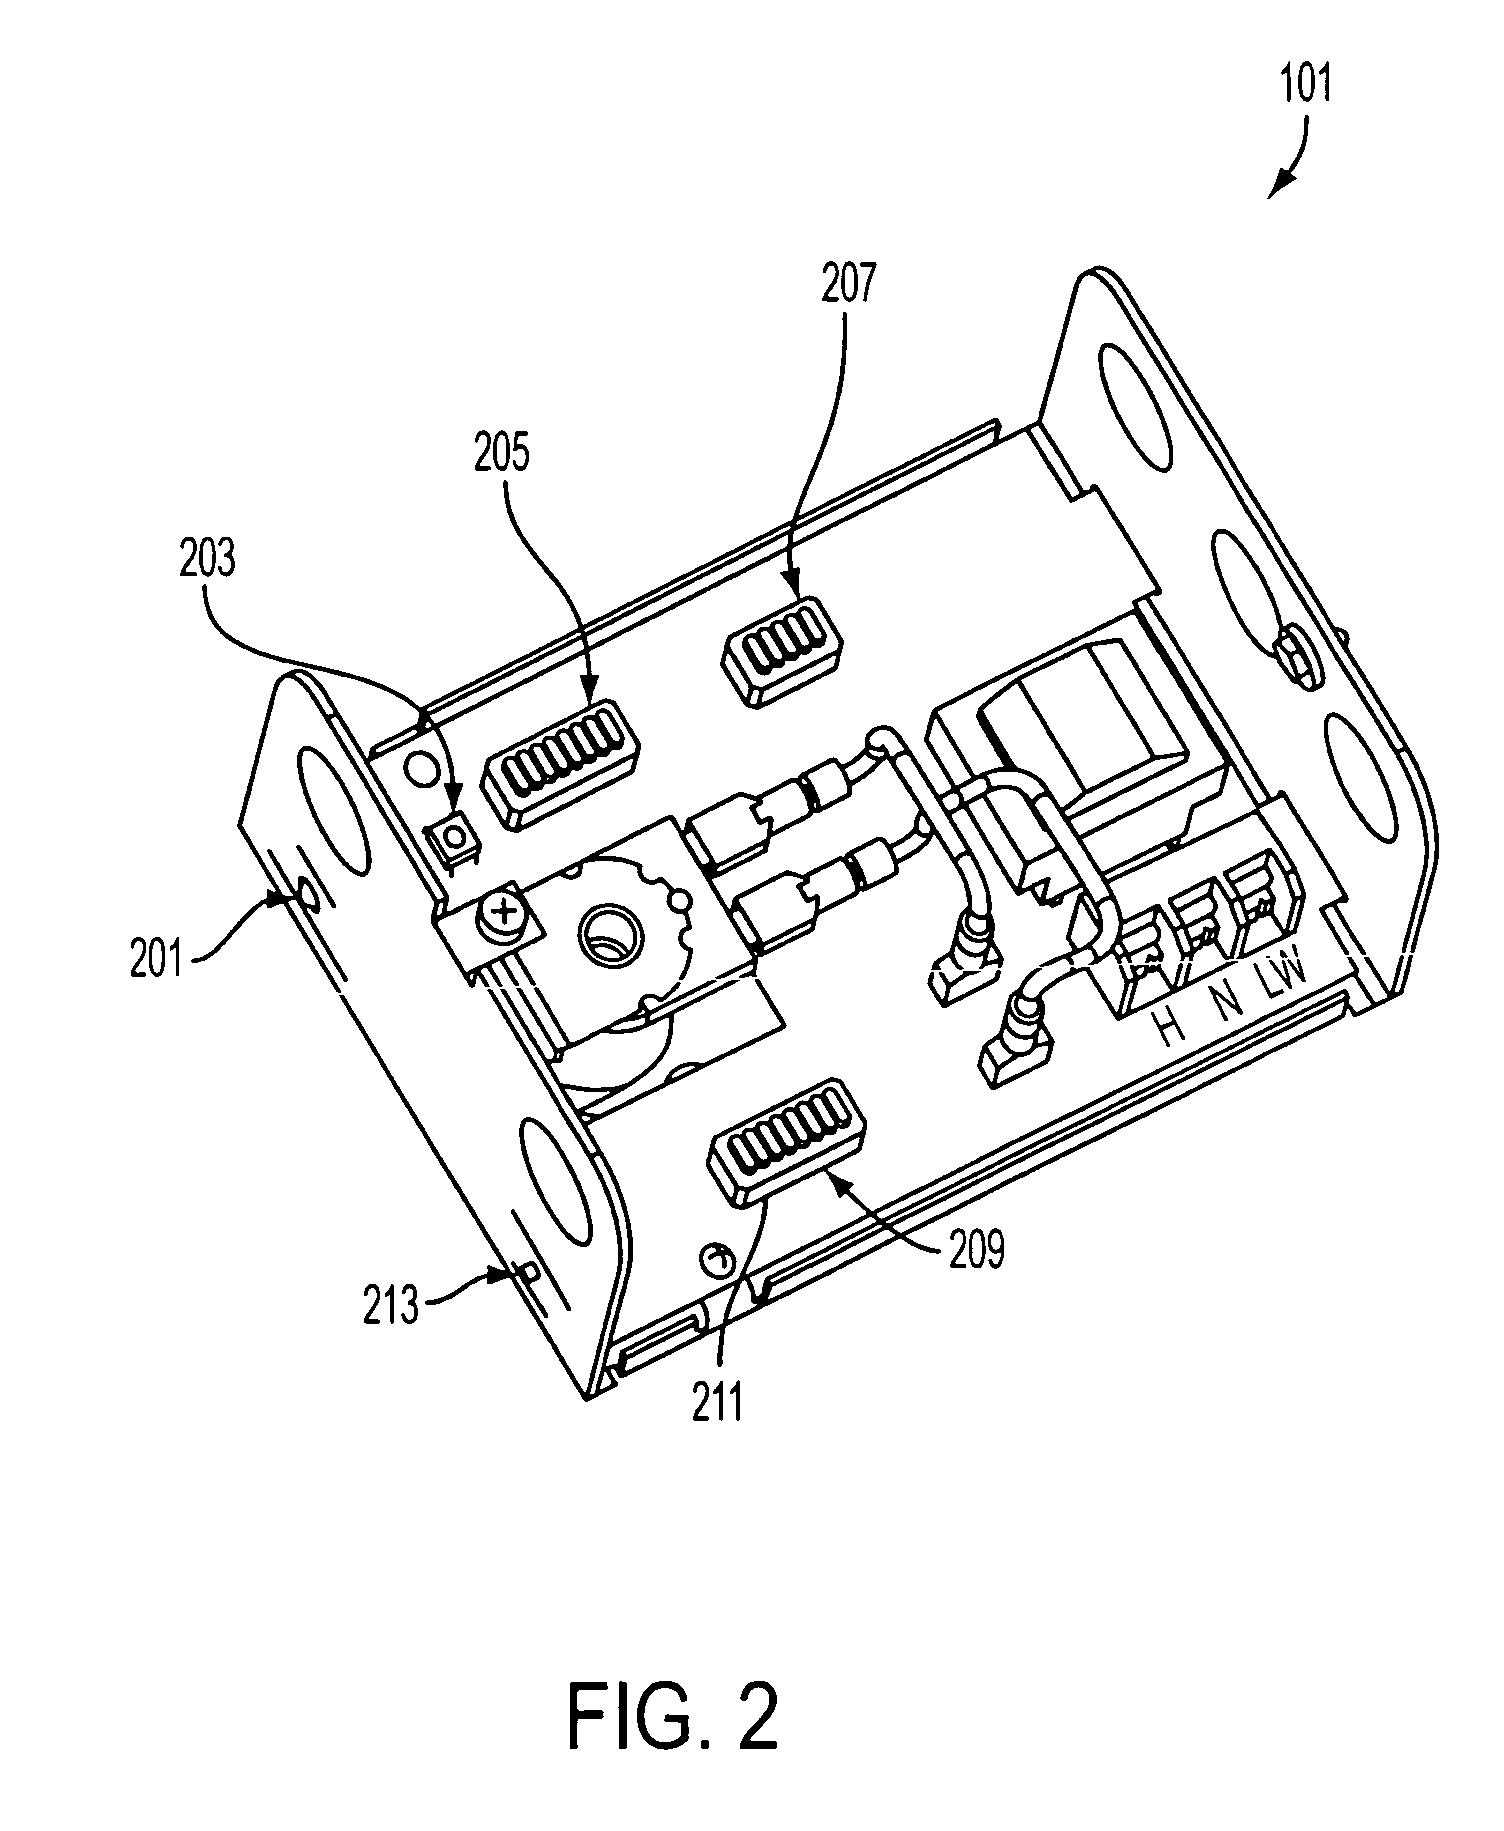 mcdonnell miller low water cutoff wiring diagram dual battery mobile boiler feeder imageresizertool com